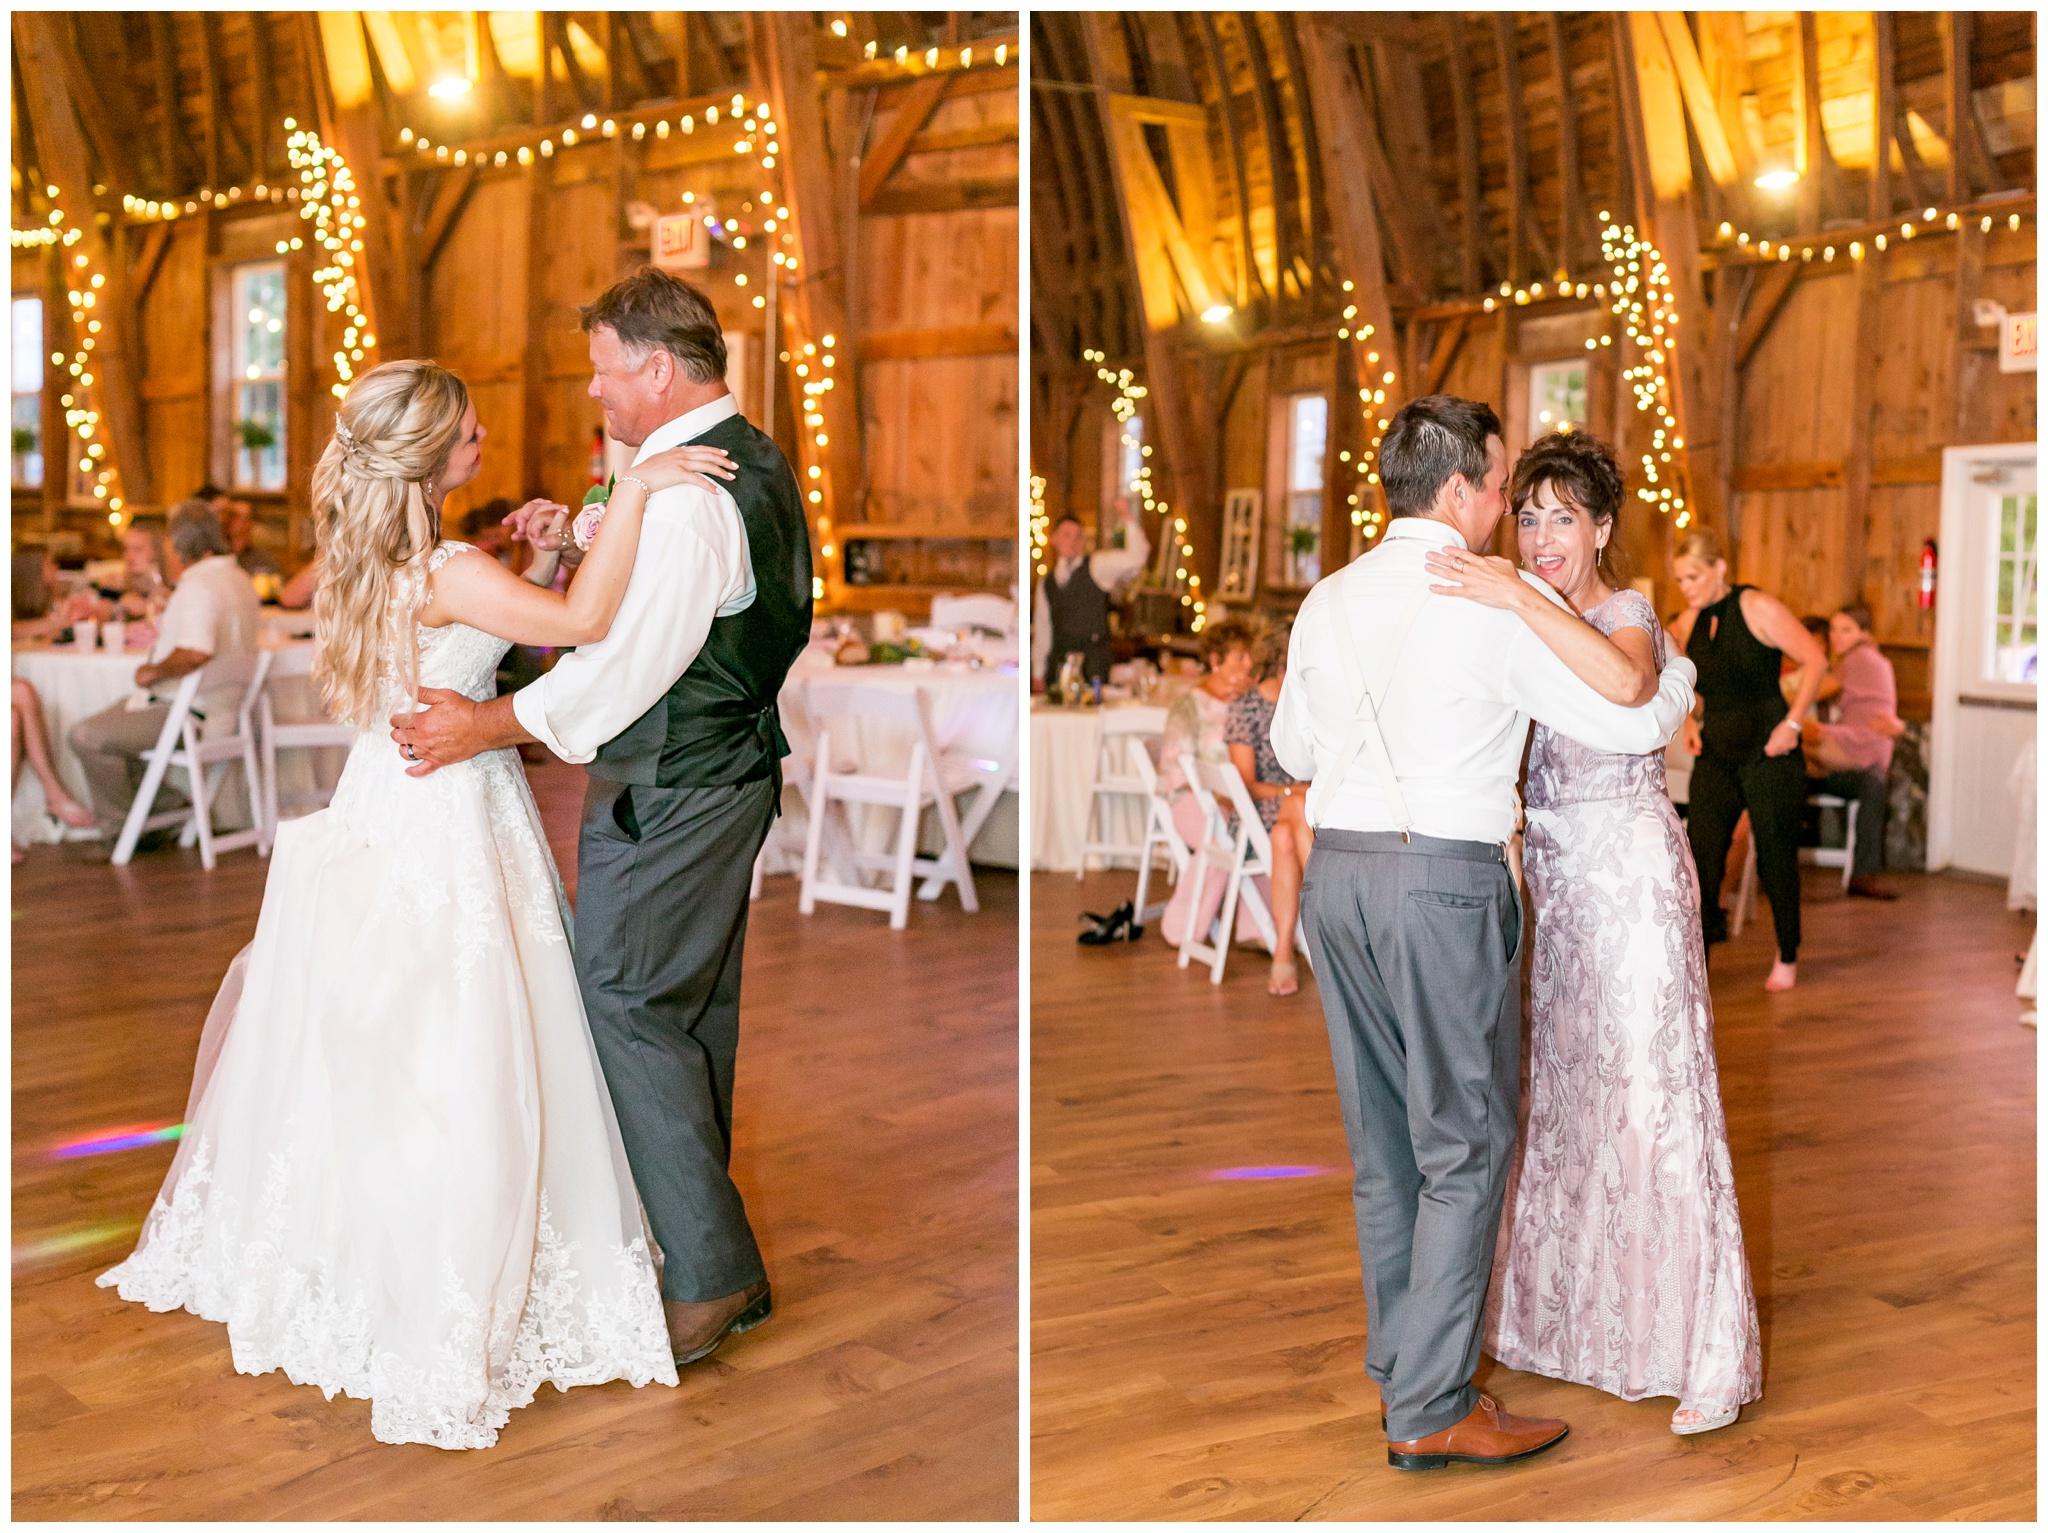 Sugarland_barn_arena_wisconsin_wedding_madison_wisconsin_4309.jpg